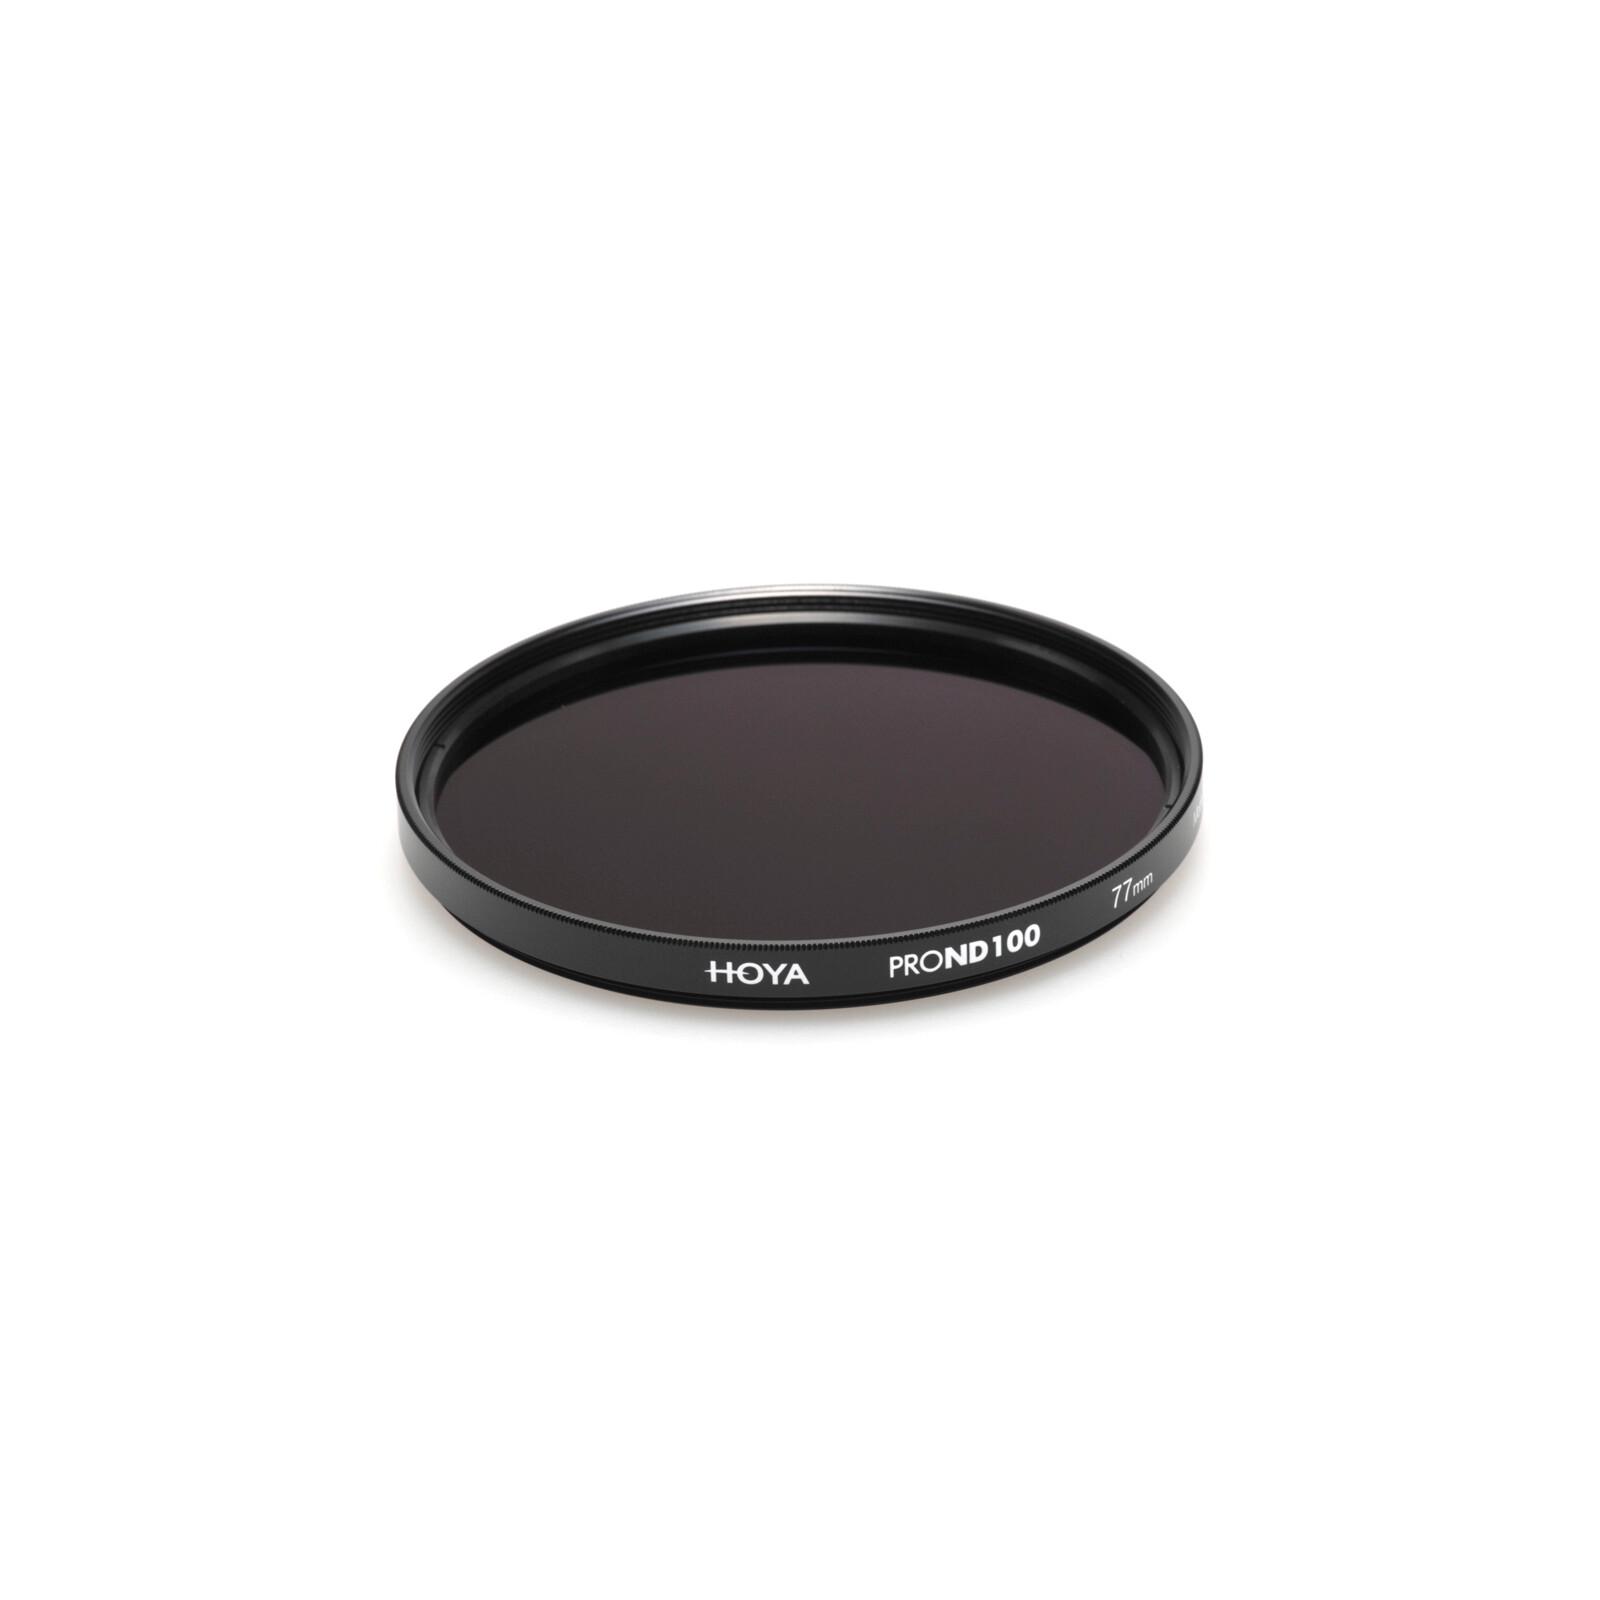 Hoya Grau PRO ND 1000 77mm